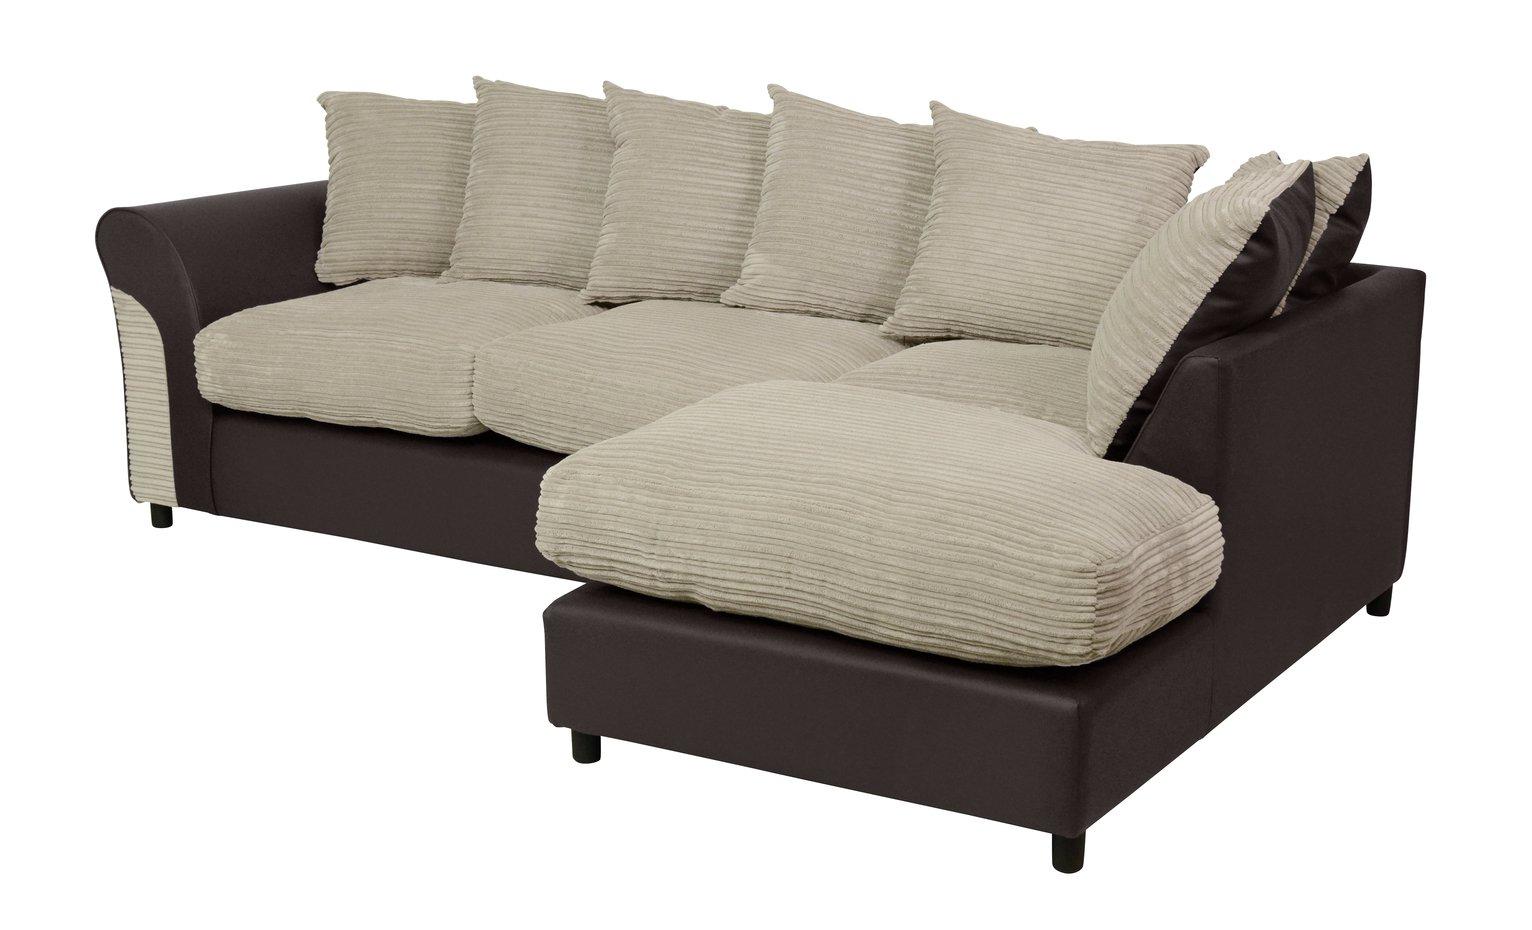 argos brooklyn sofa large mah jong price riley fabric right hand corner group unit natural